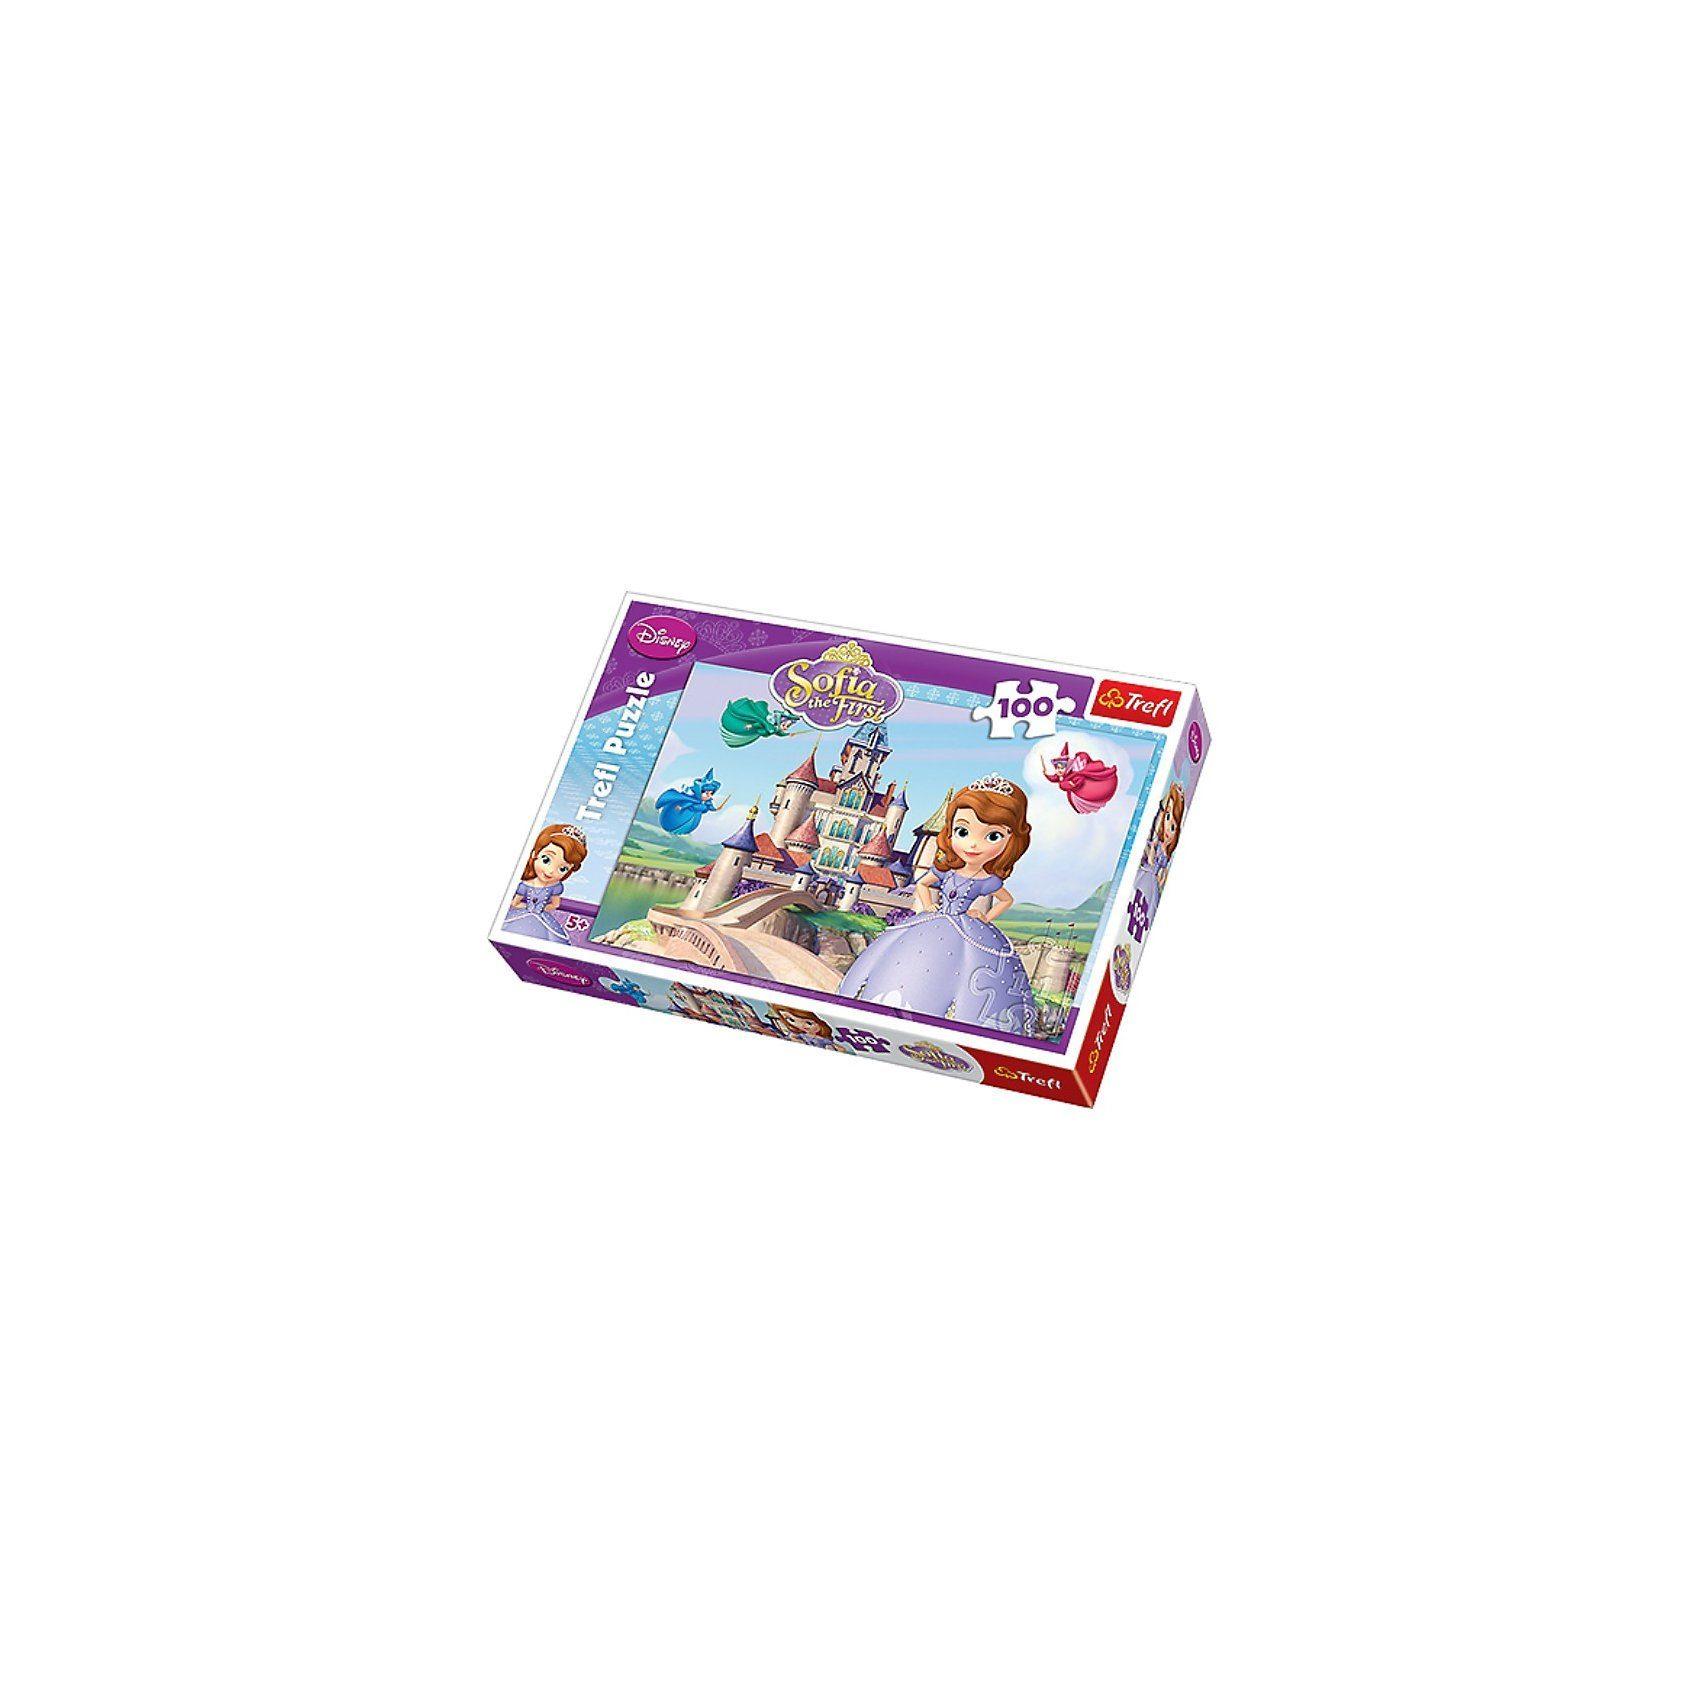 Trefl Puzzle 100 Teile - Sofia die Erste